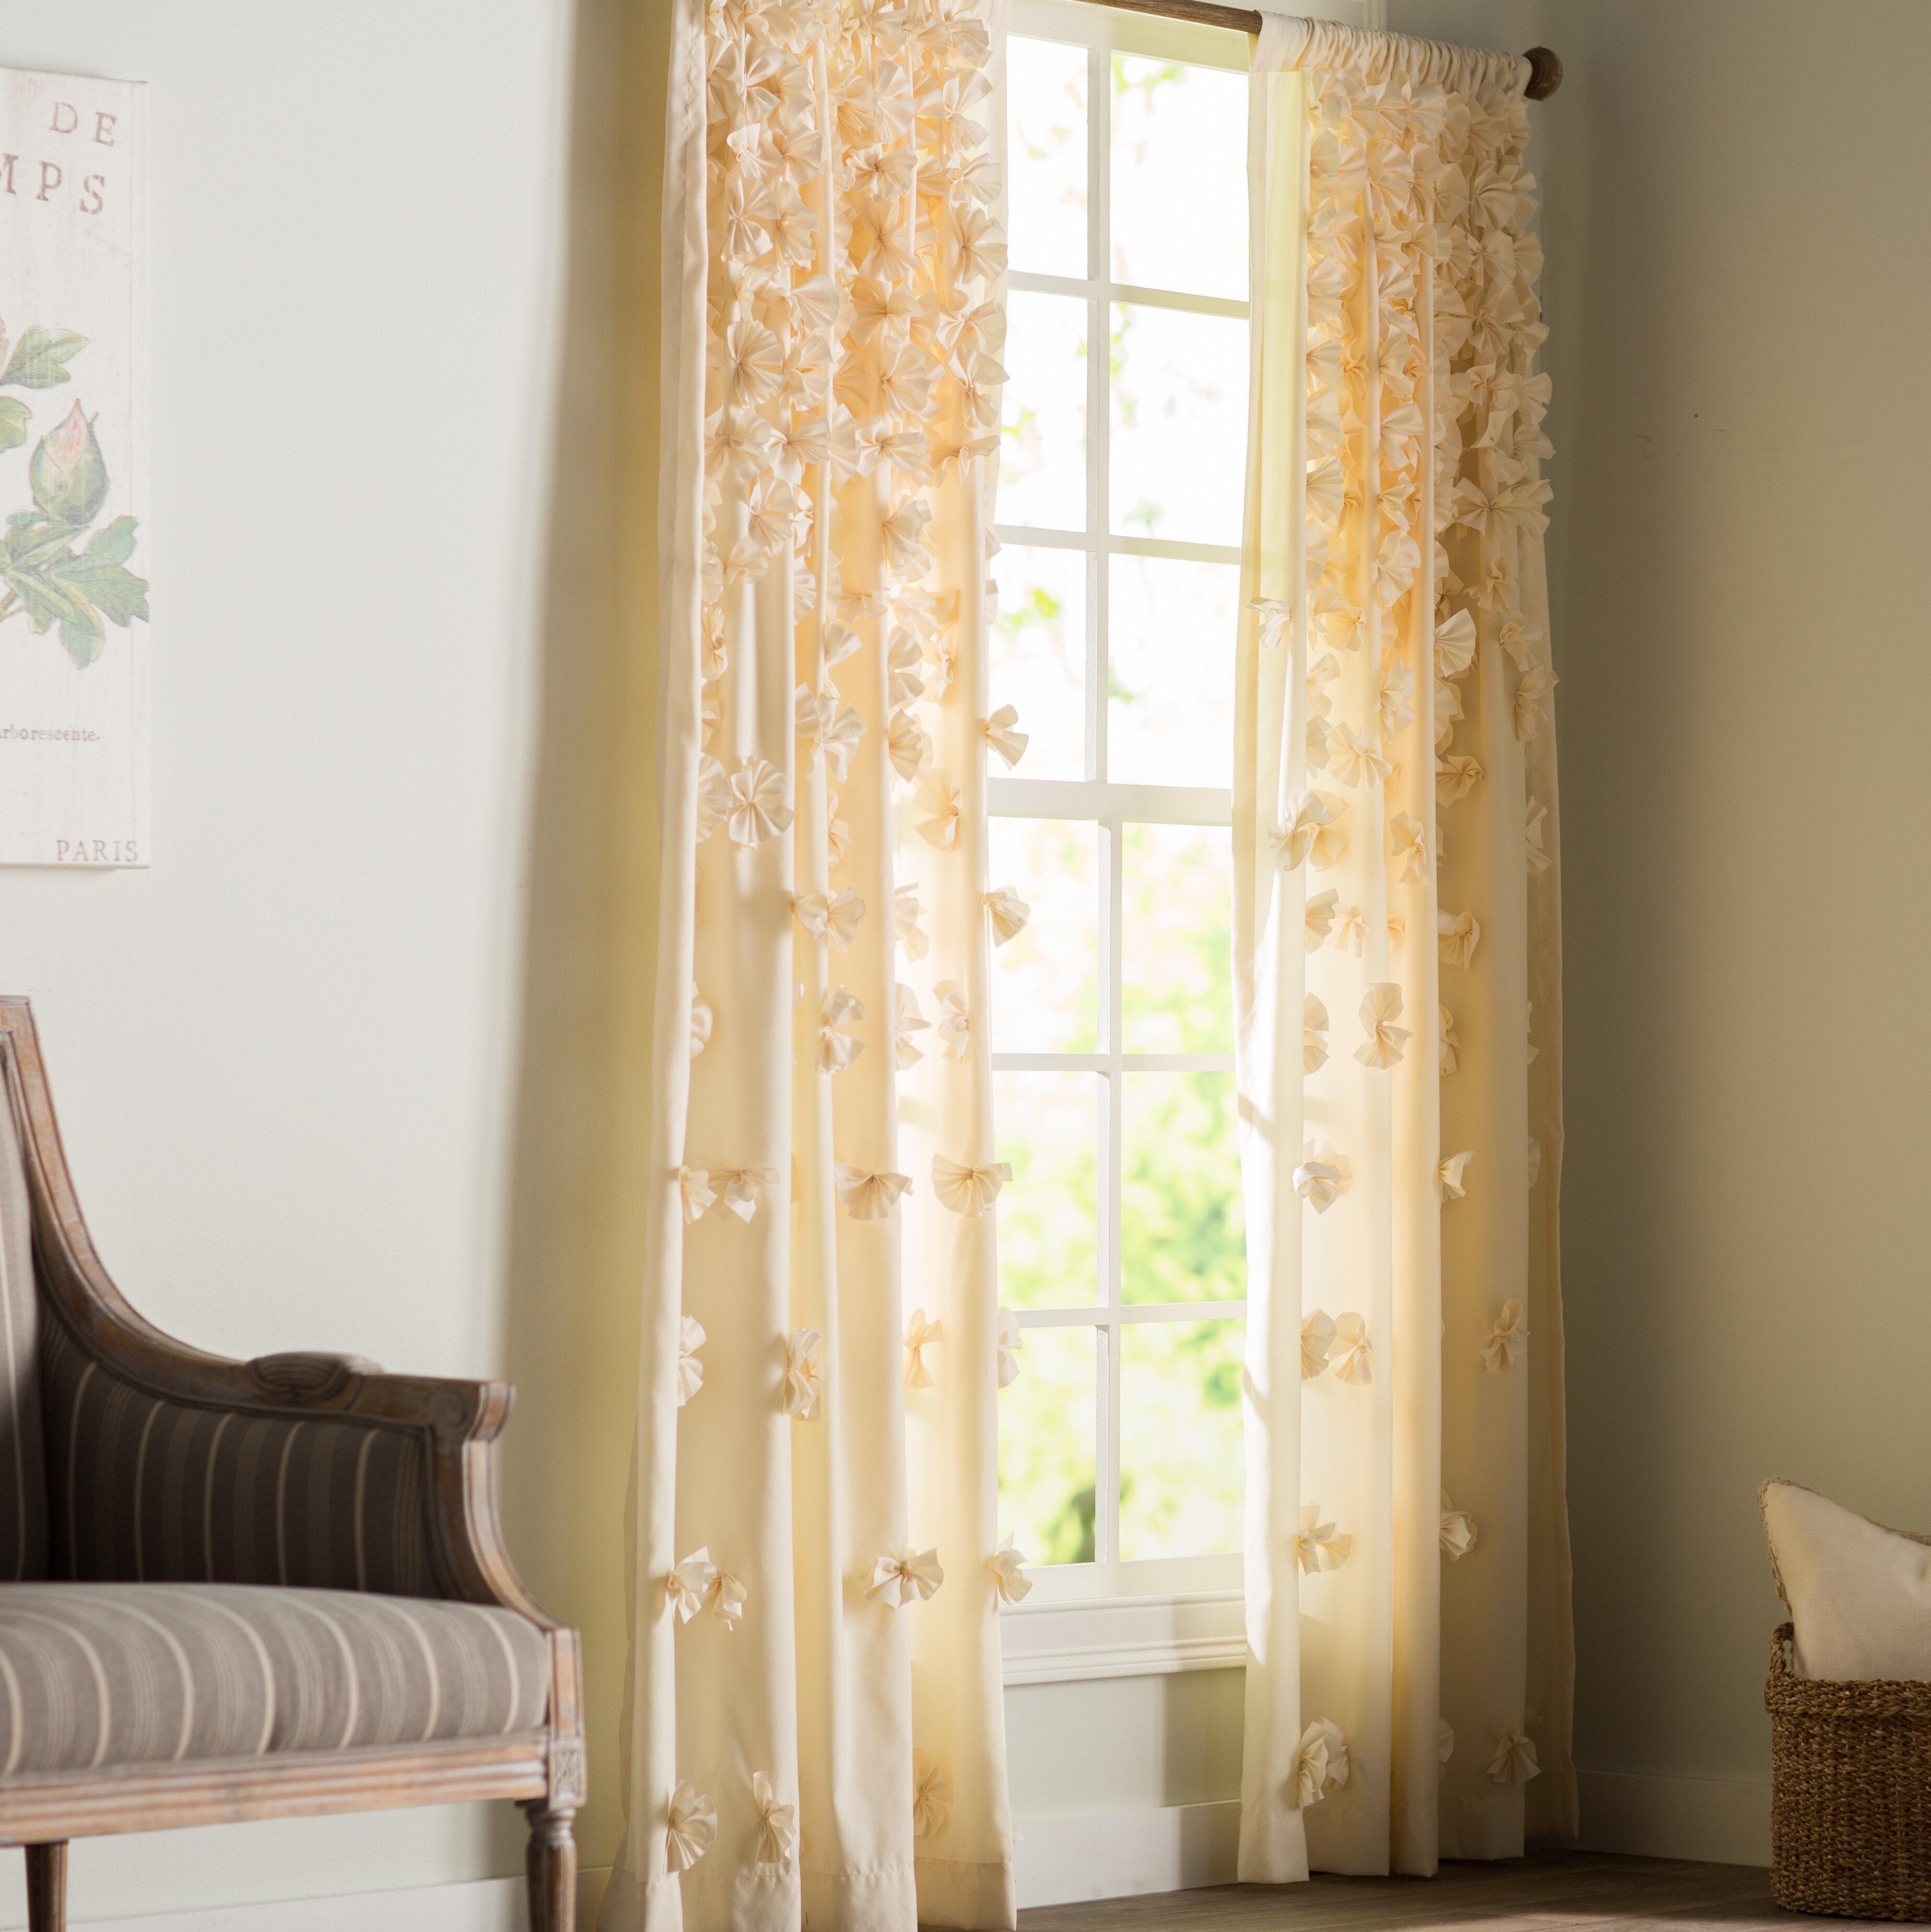 Ophelia Co Clarkstown Floral Semi Sheer Rod Pocket Single Curtain Panel Reviews Wayfair